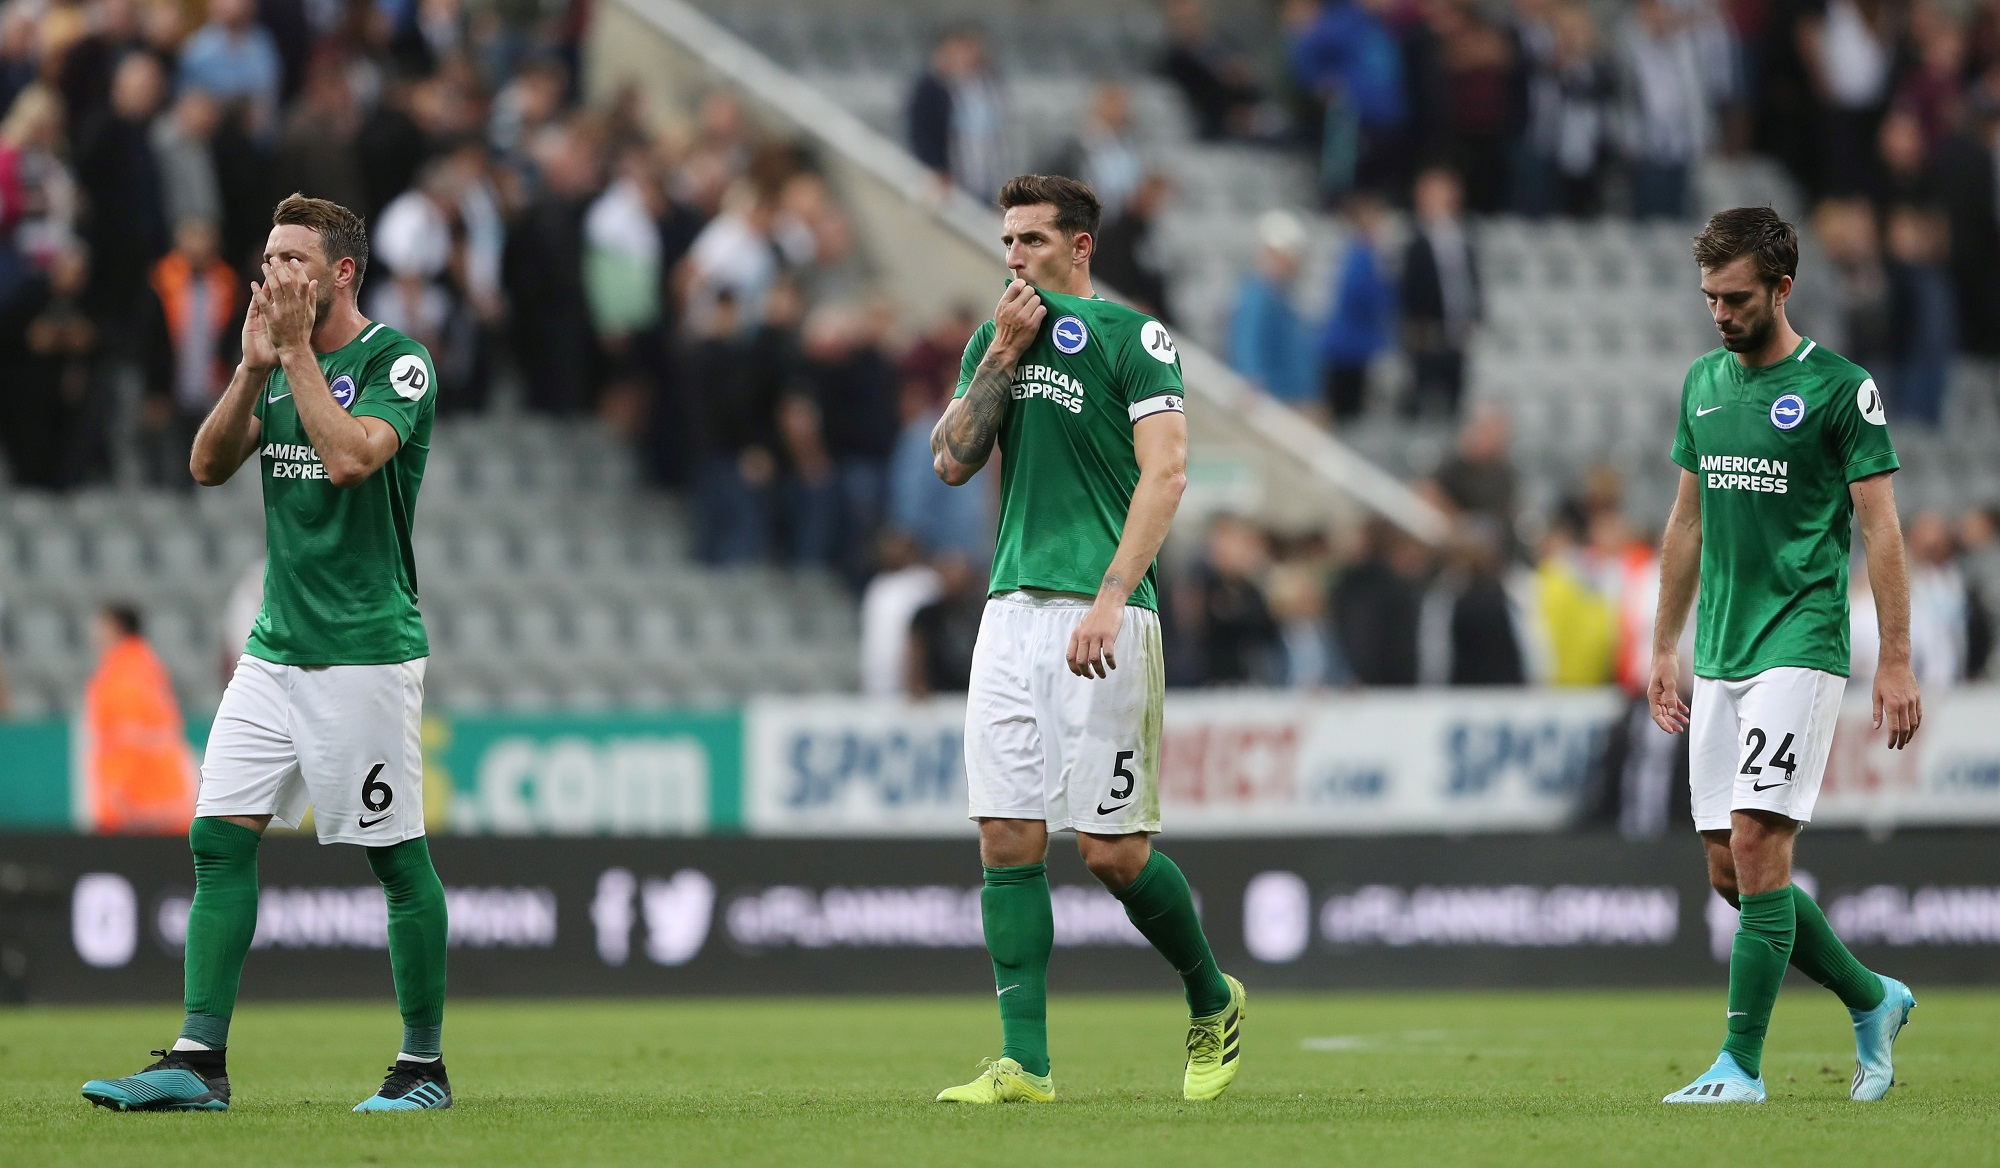 Brighton & Hove Albion FC transfers list 2019: Brighton new player signings 2018/19